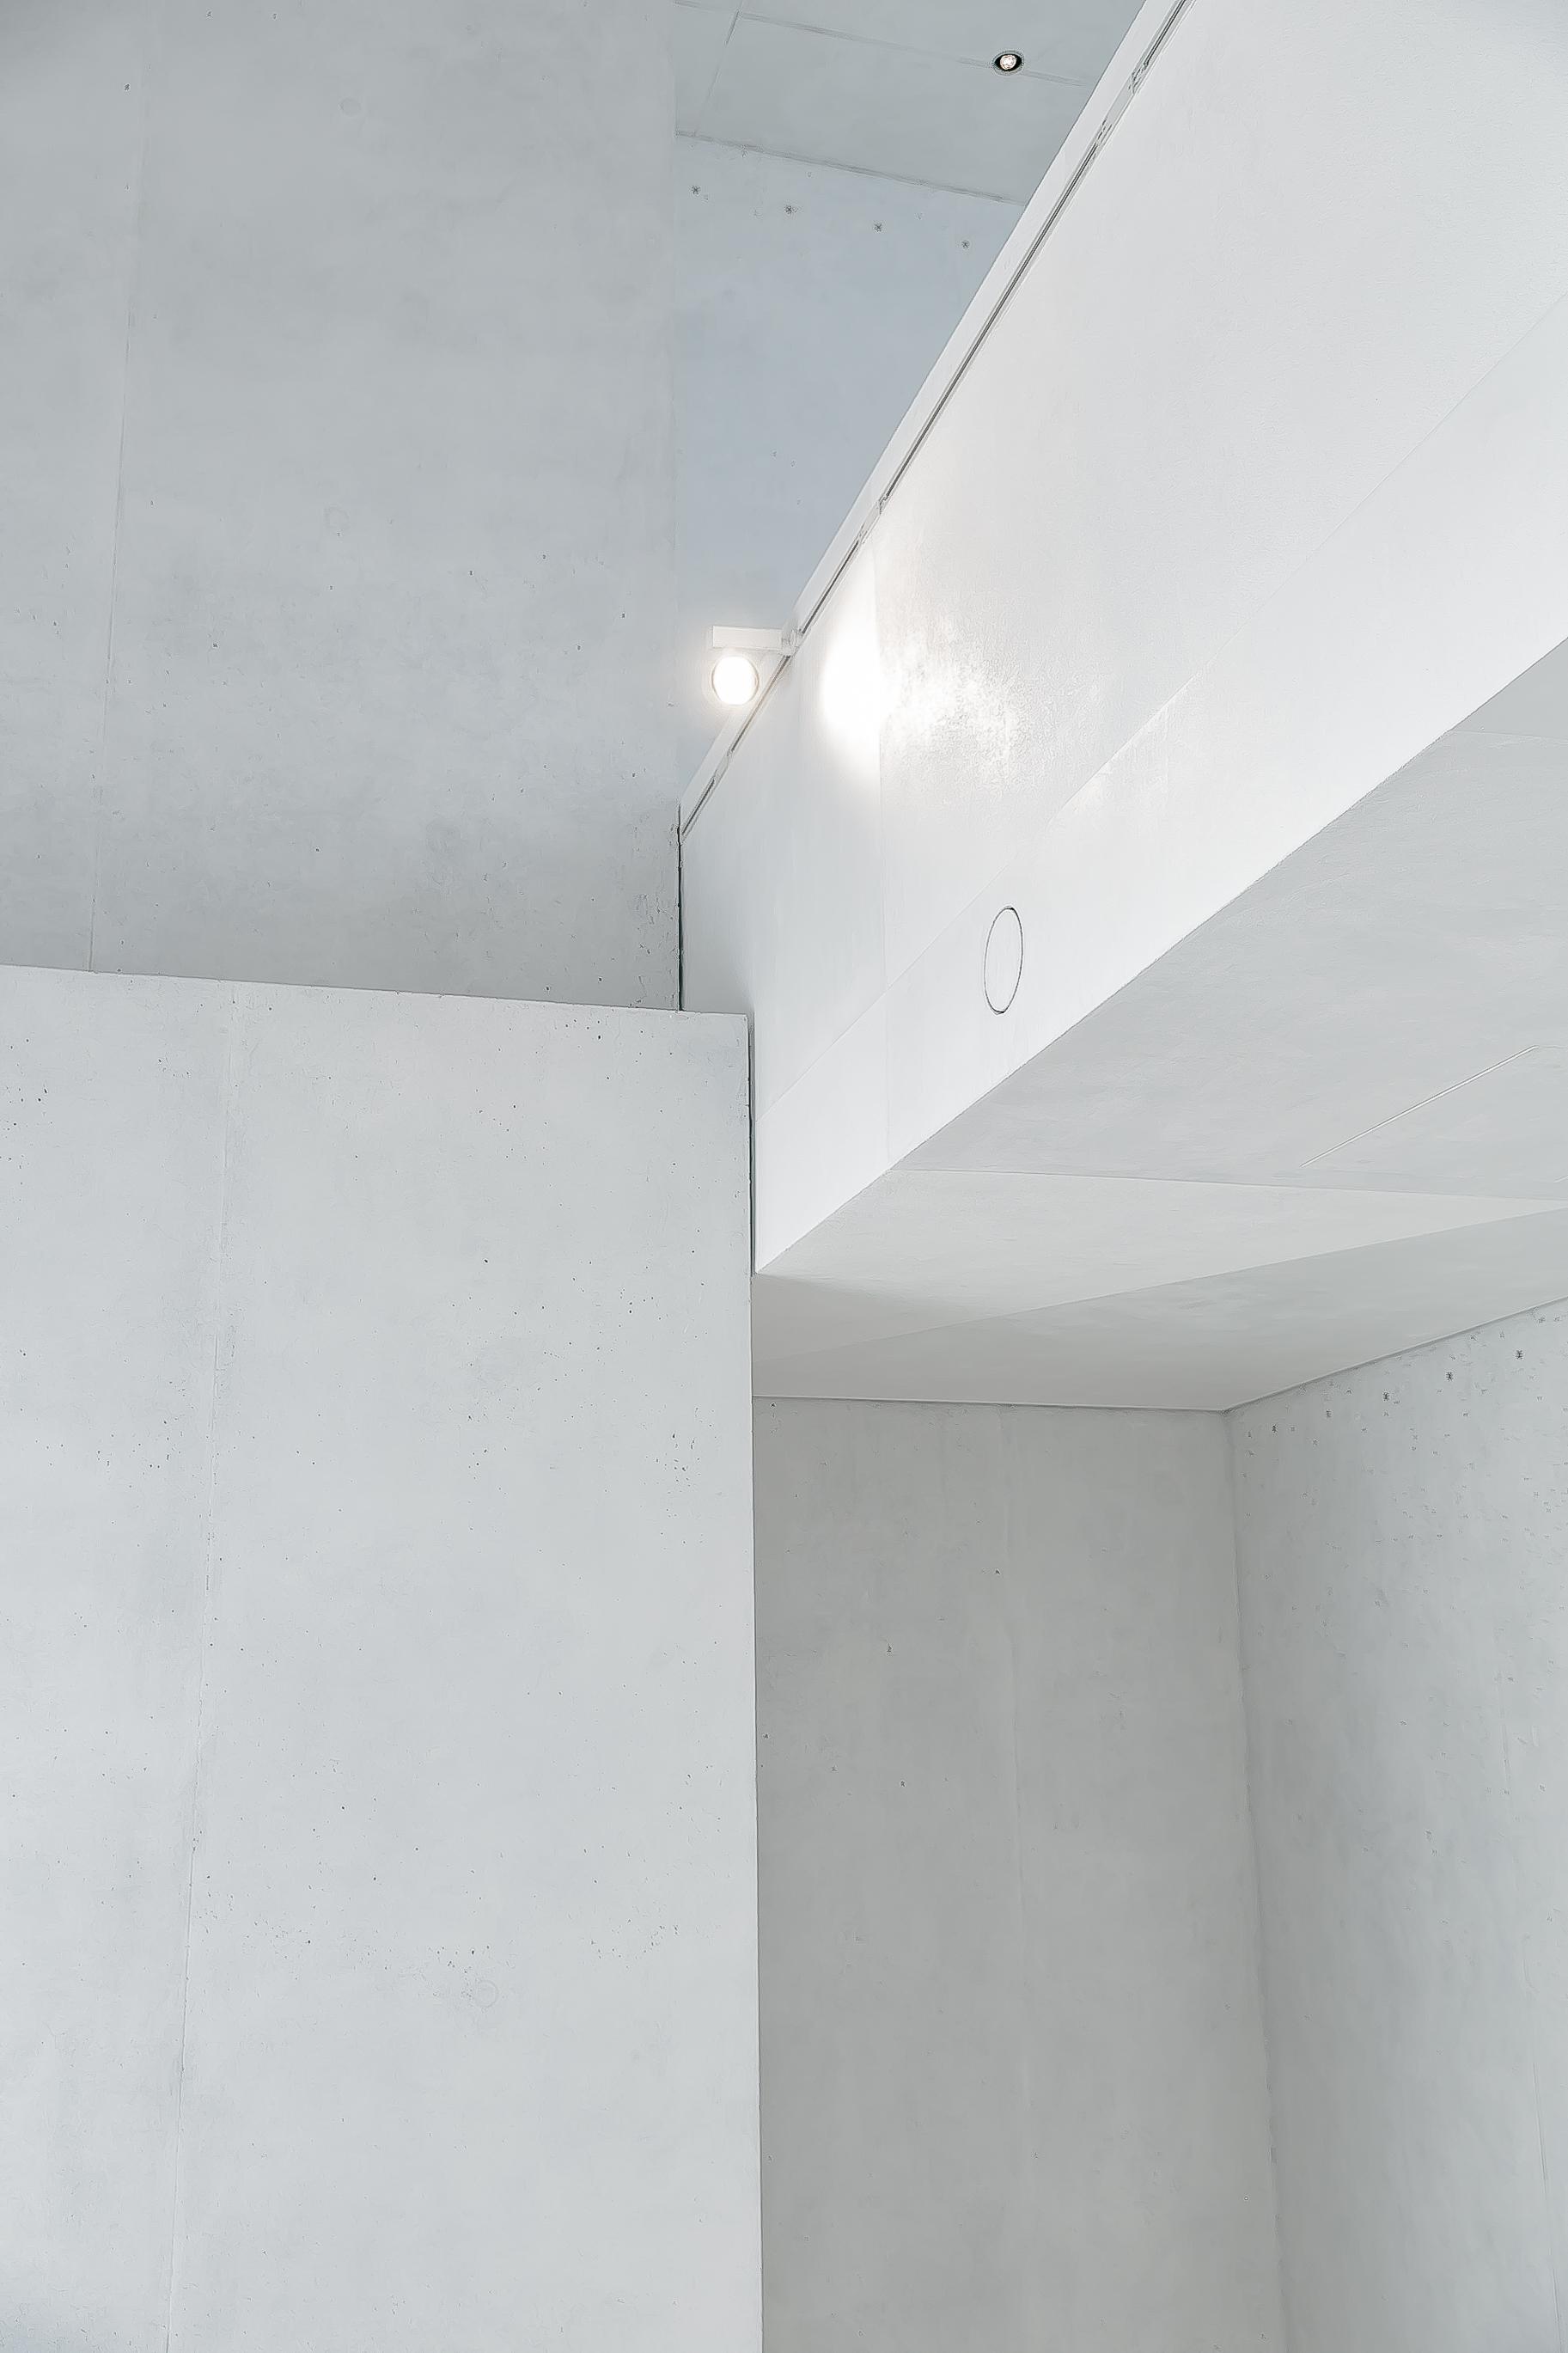 Bauhaus Masters' Houses